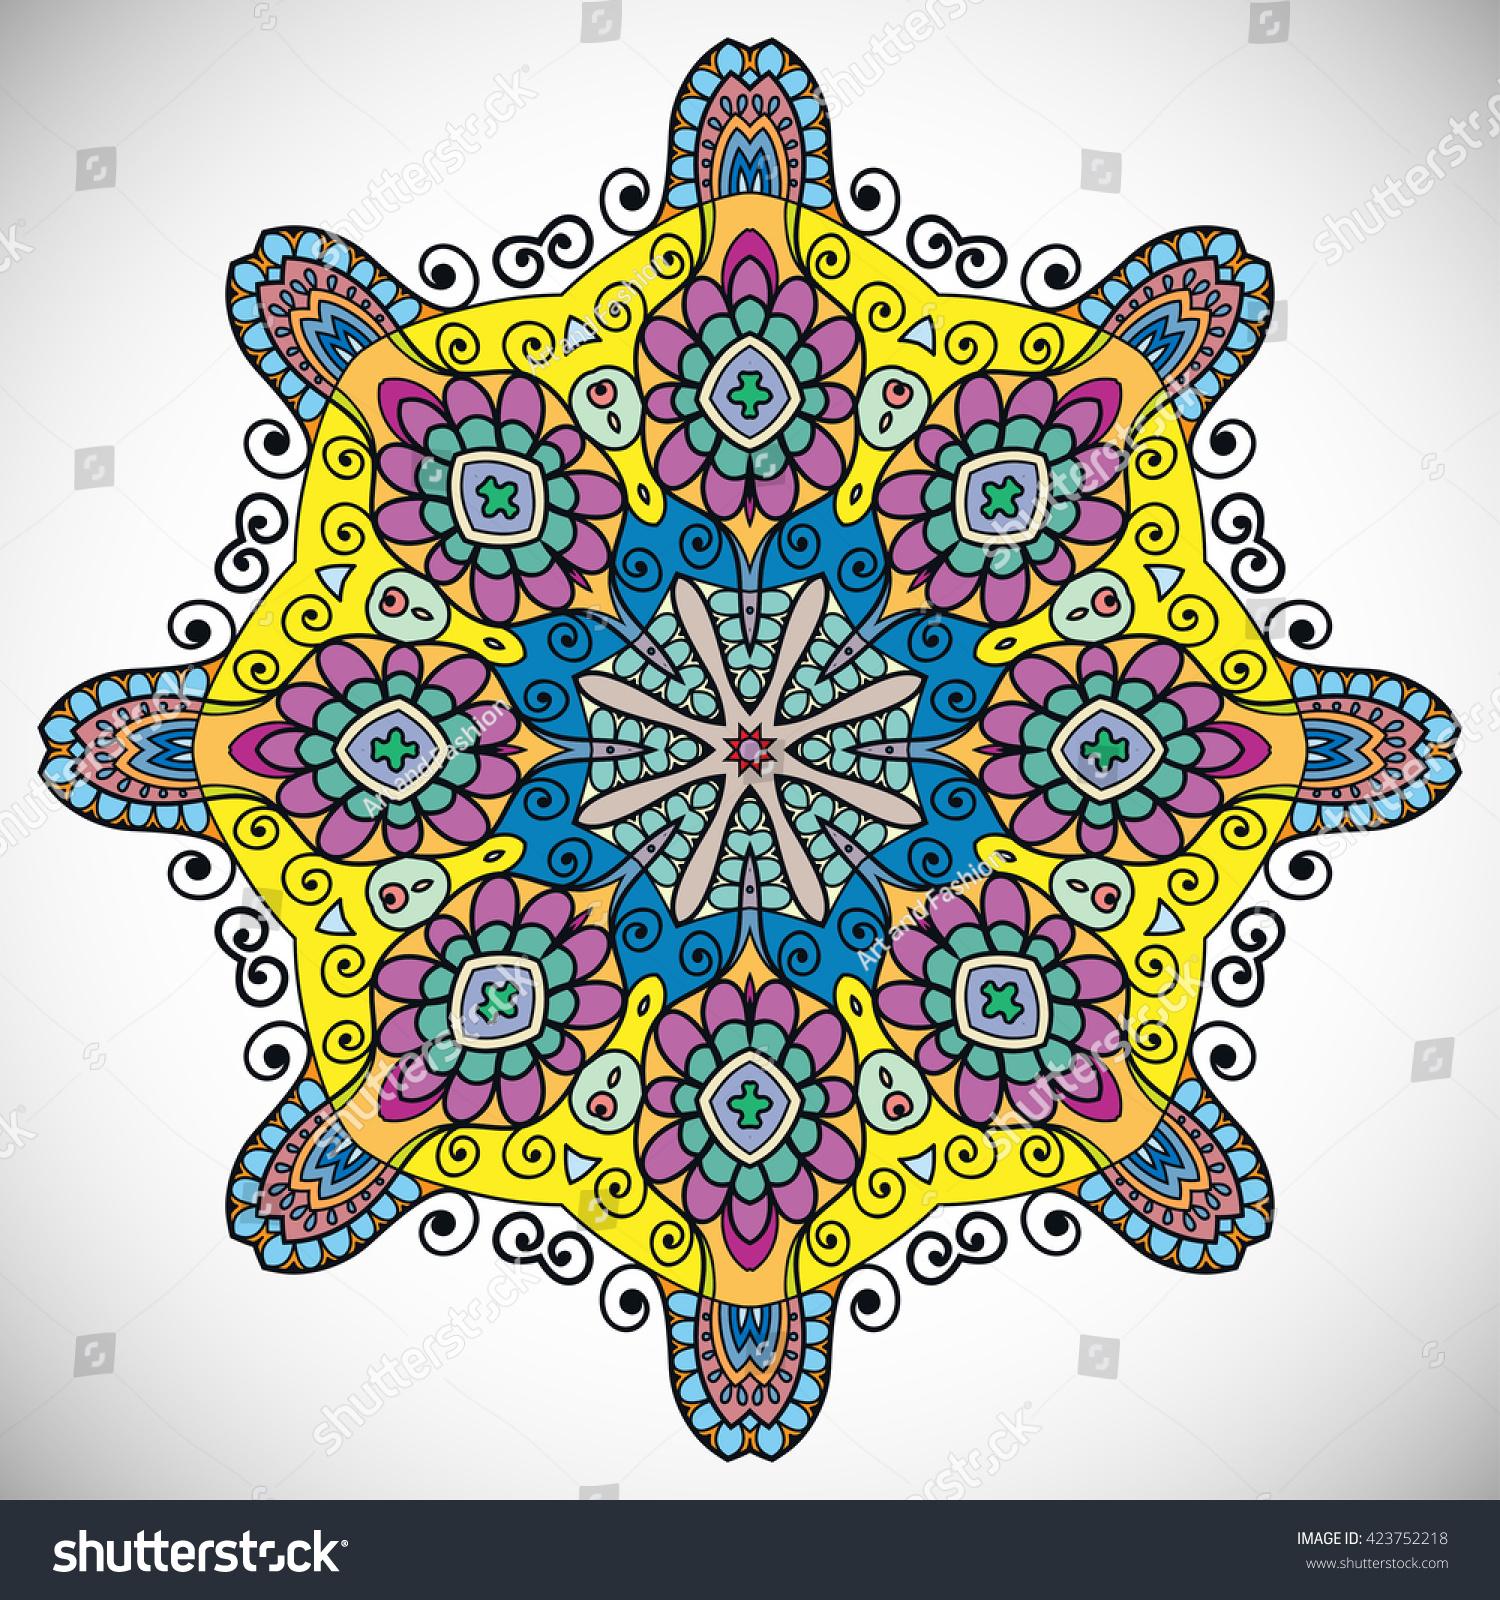 stock vector mandala flower decoration oriental pattern isolated design element zentangle style decor for